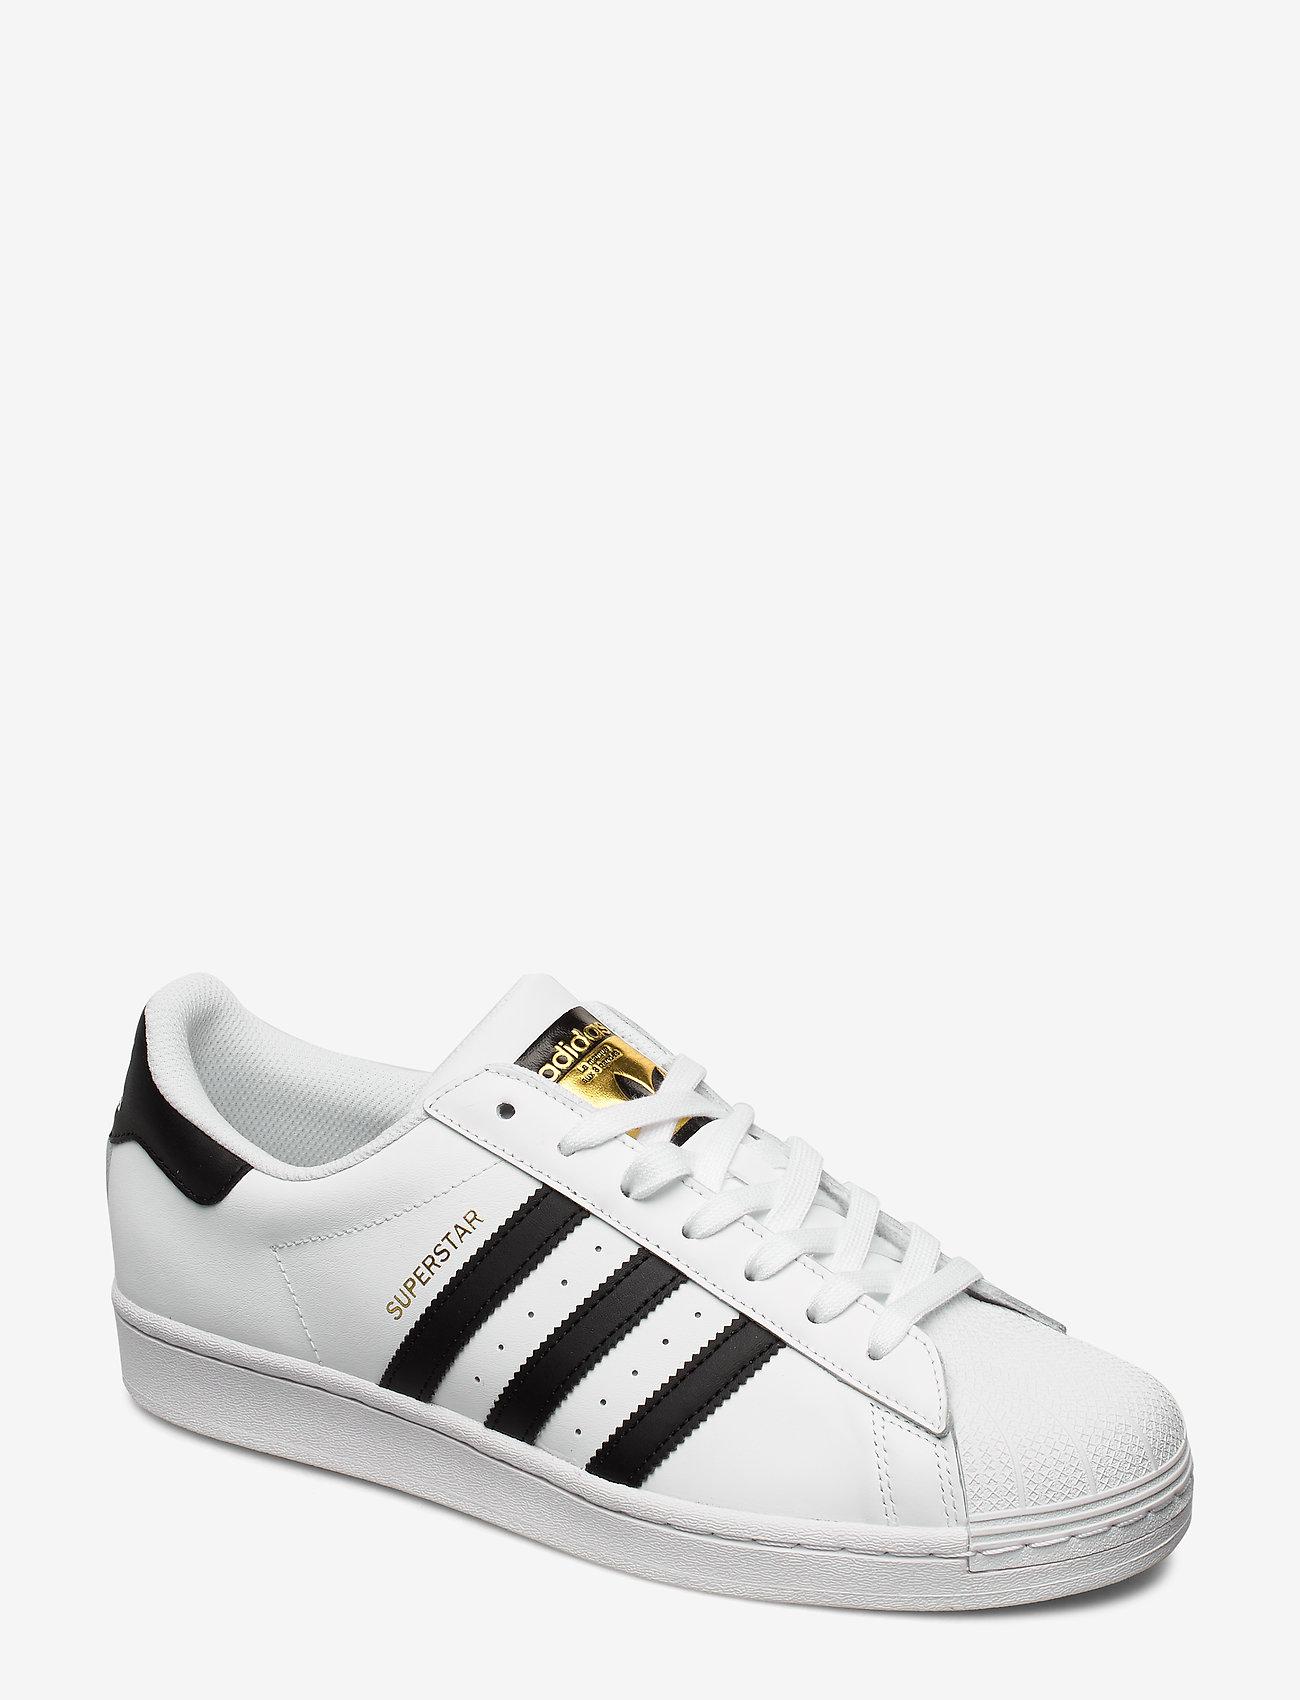 adidas Originals - SUPERSTAR - lav ankel - ftwwht/cblack/ftwwht - 0